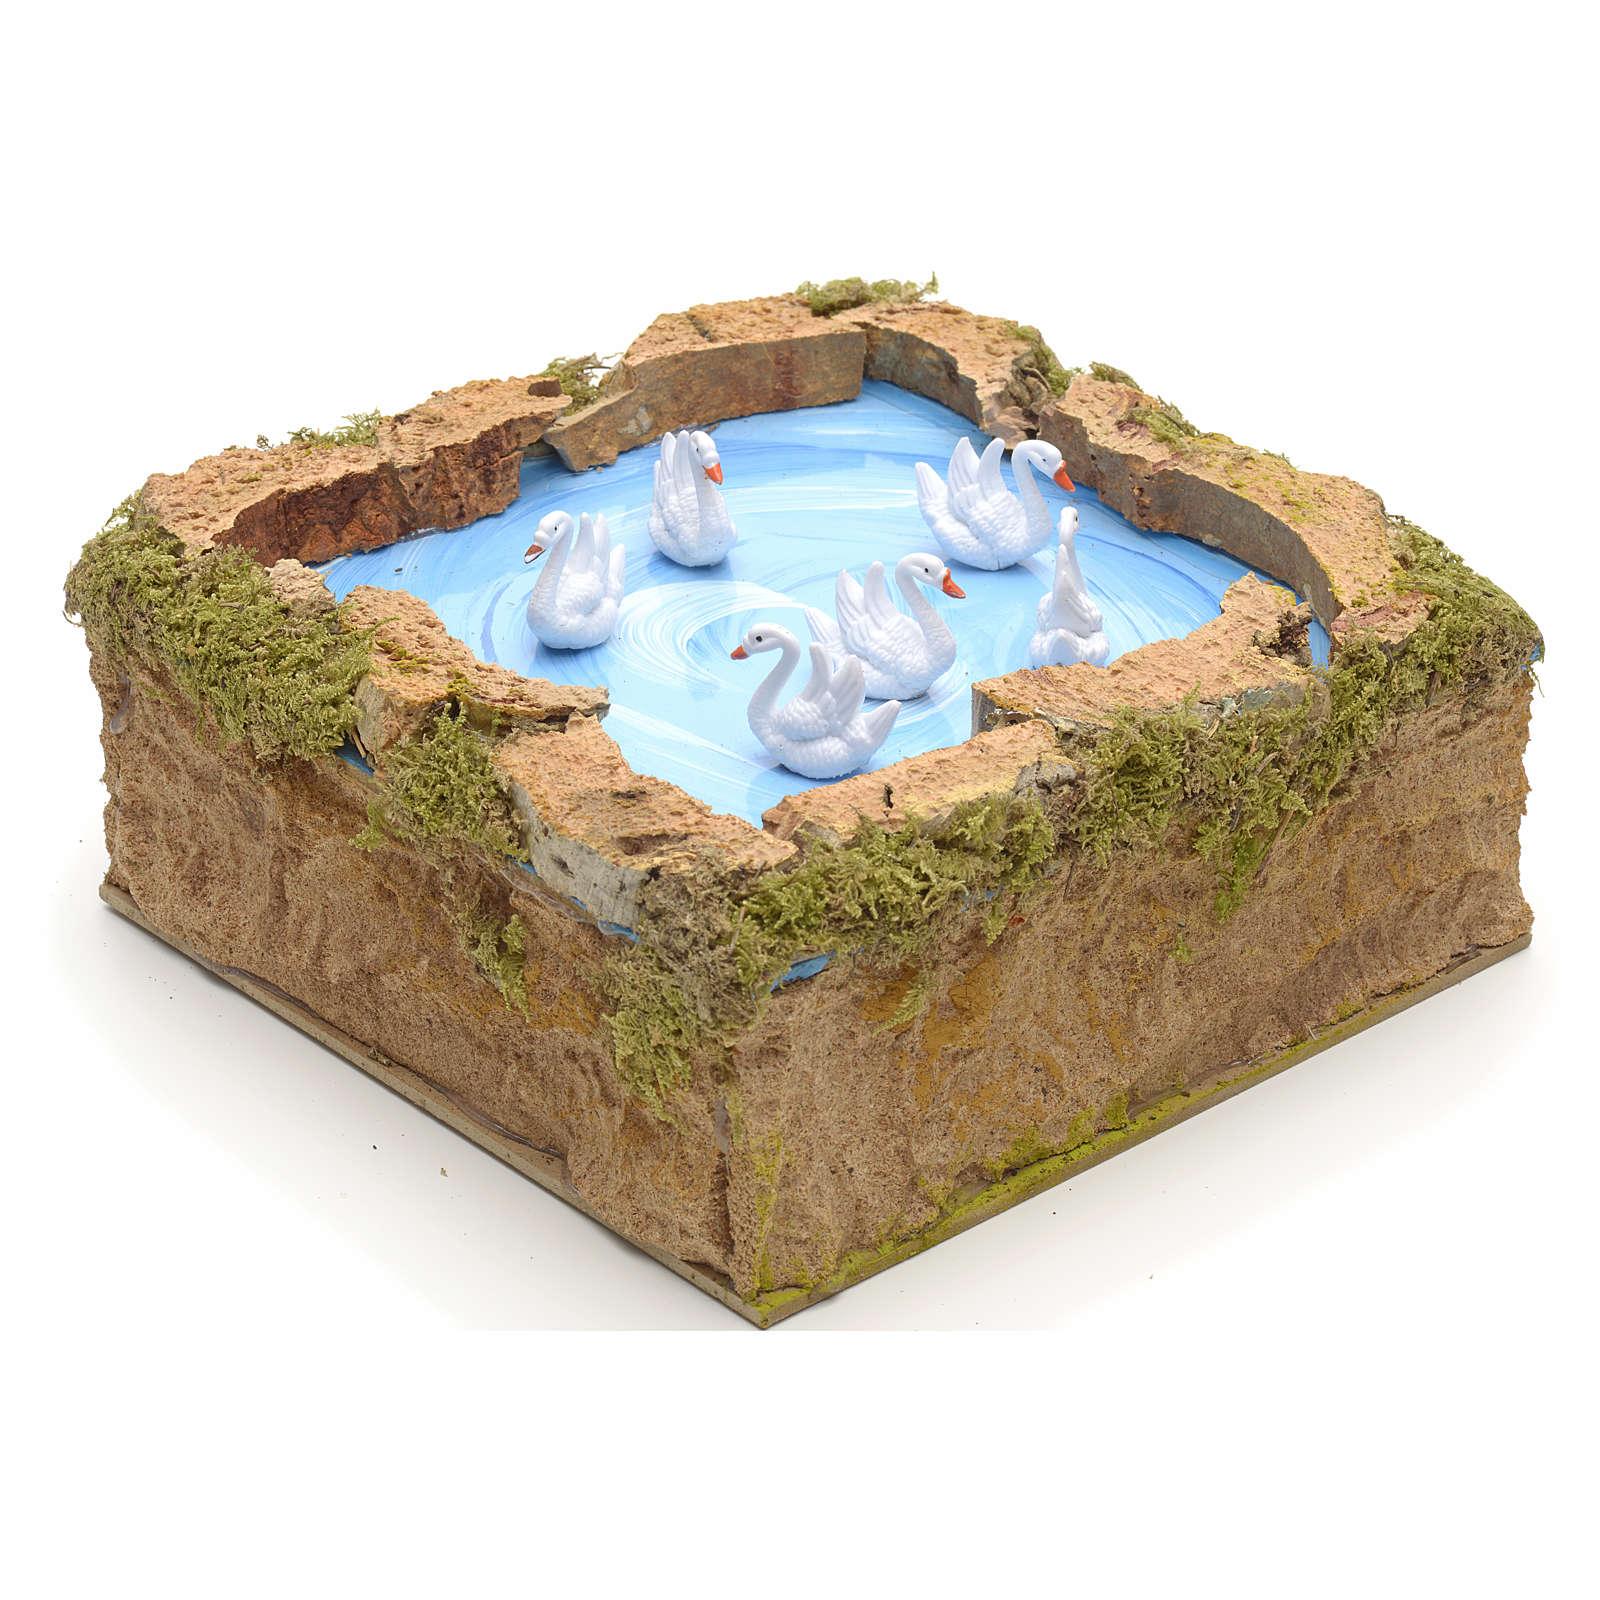 Animated nativity scene figurine, lake with moving swans 5x20x20 3